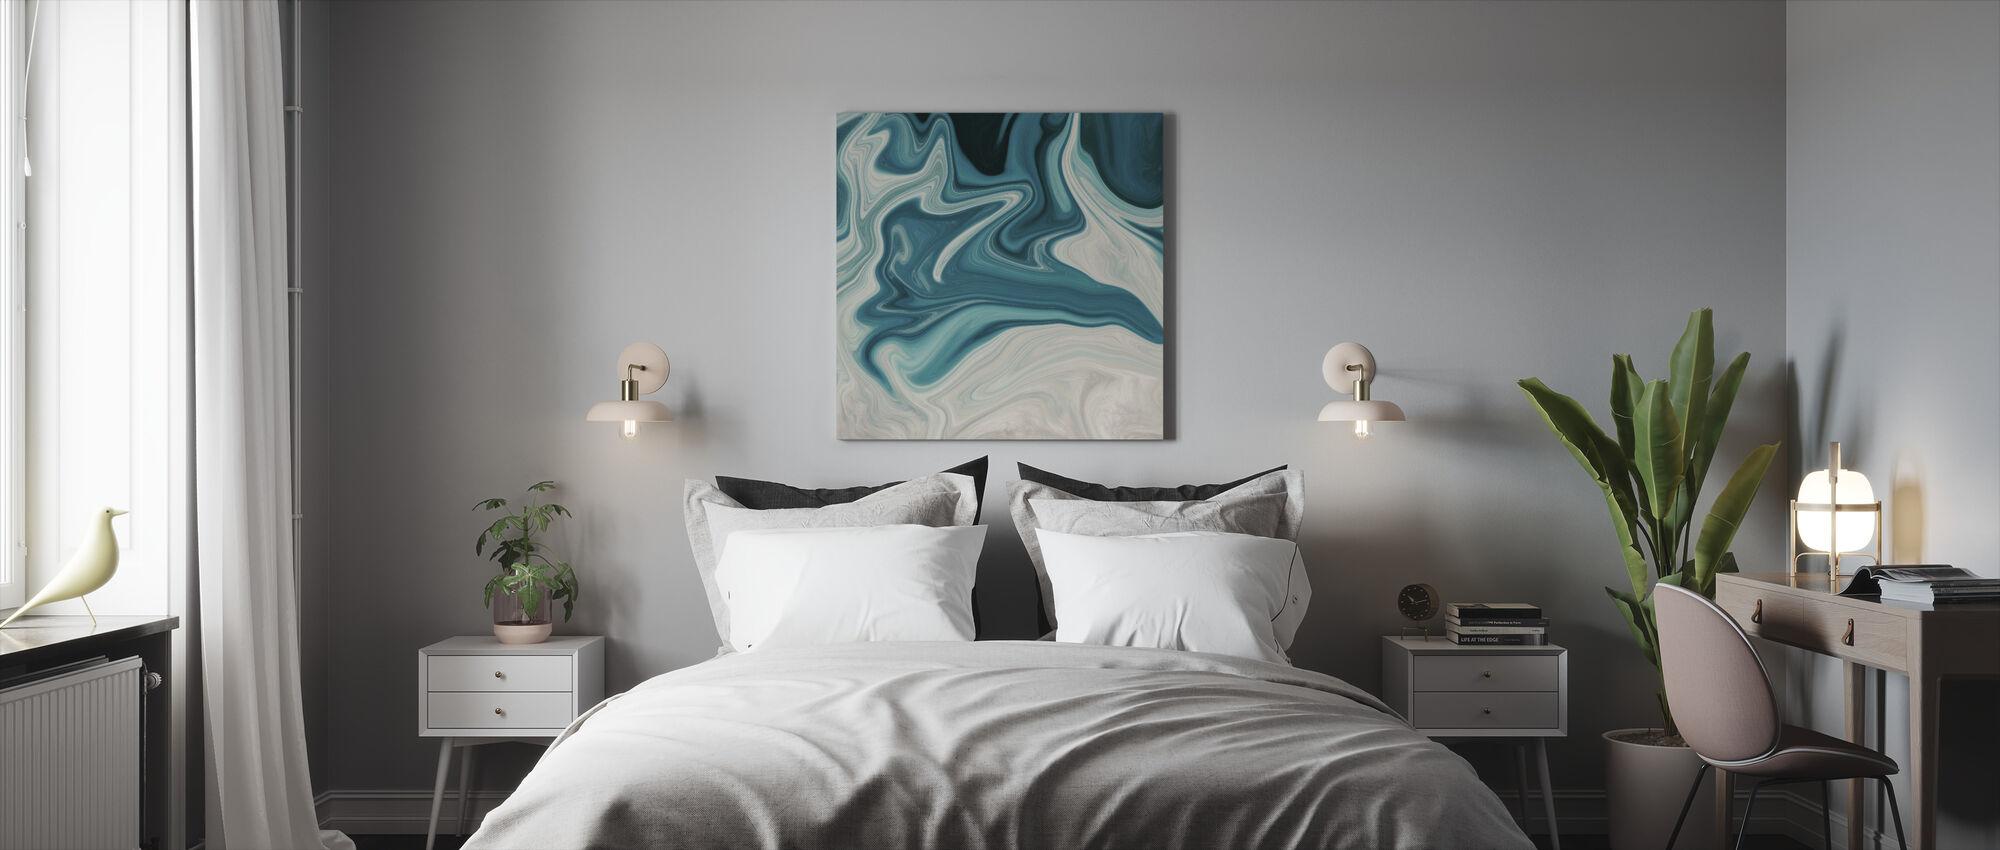 Sea of Marble - Canvas print - Bedroom